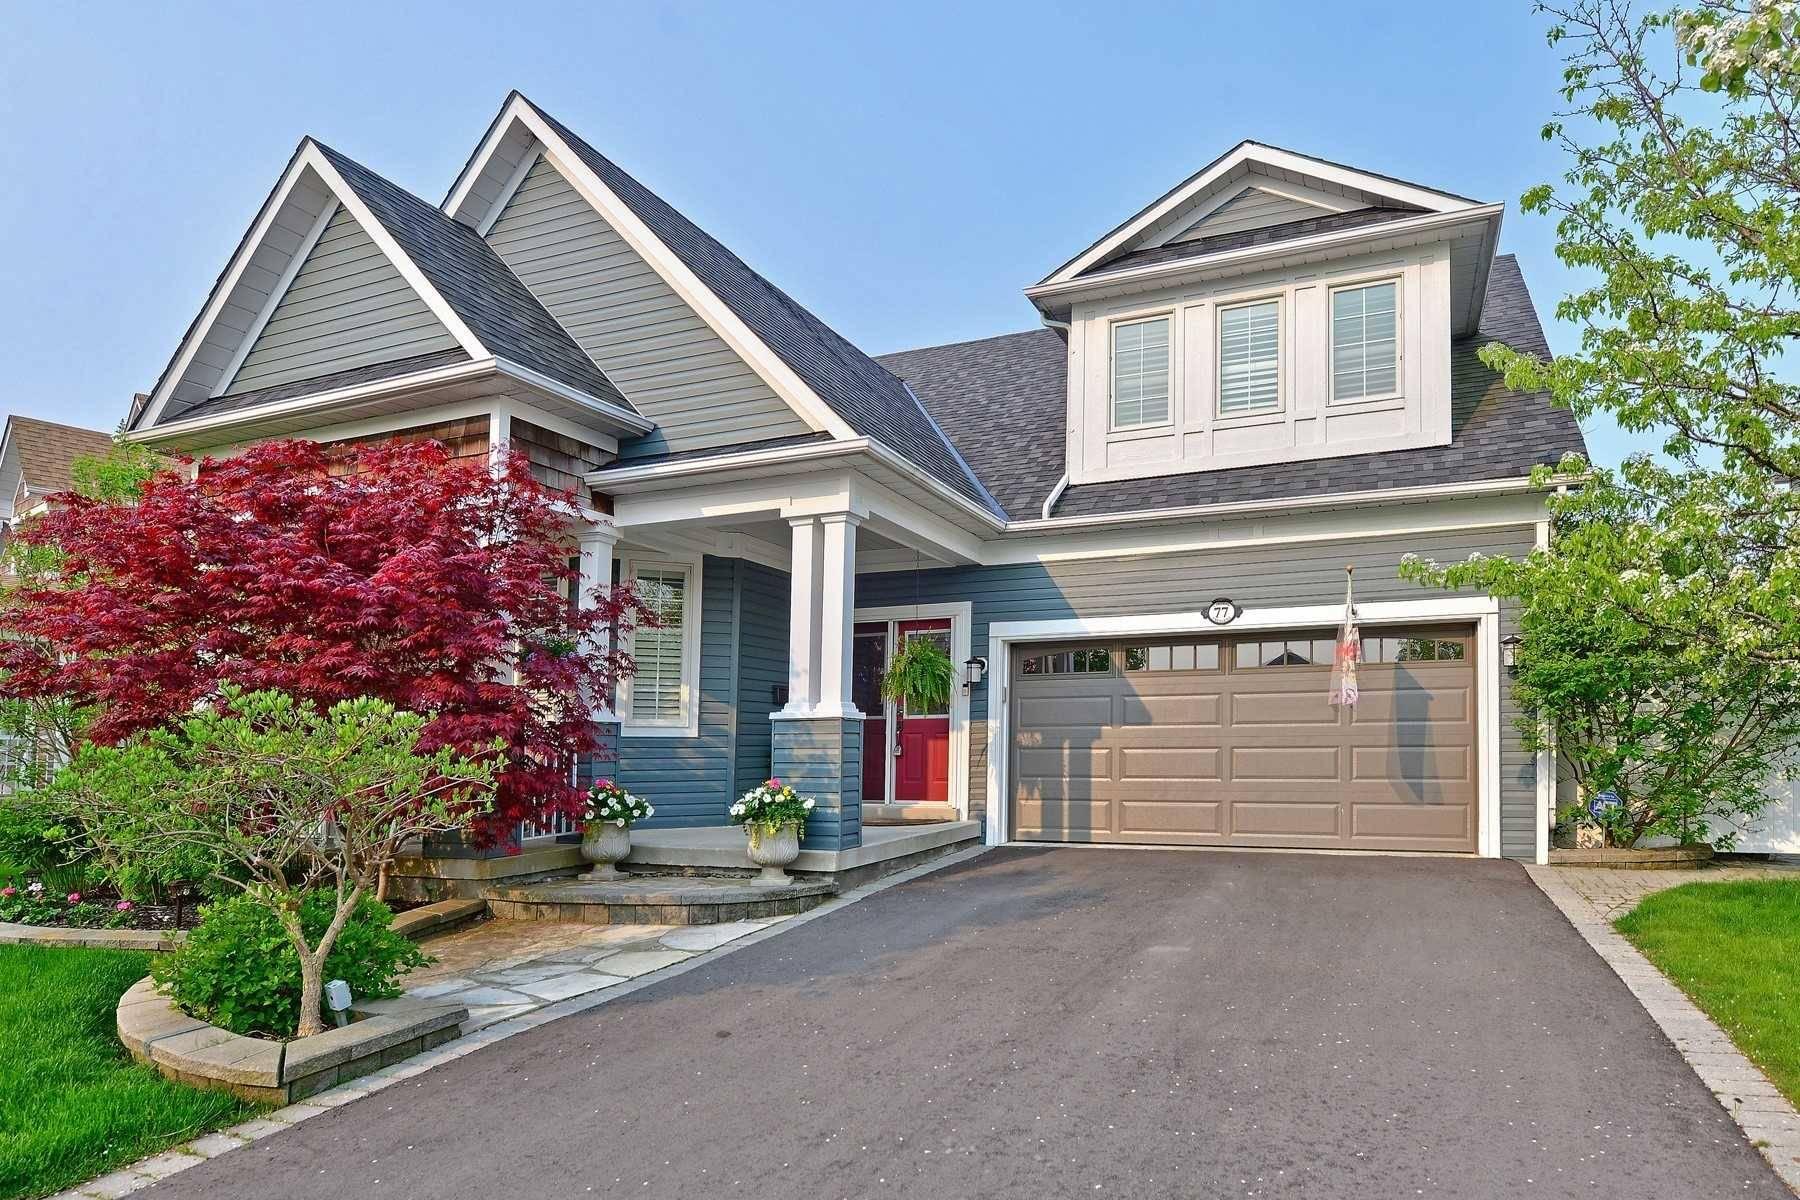 House for sale at 77 Carveth Cres Clarington Ontario - MLS: E4446473